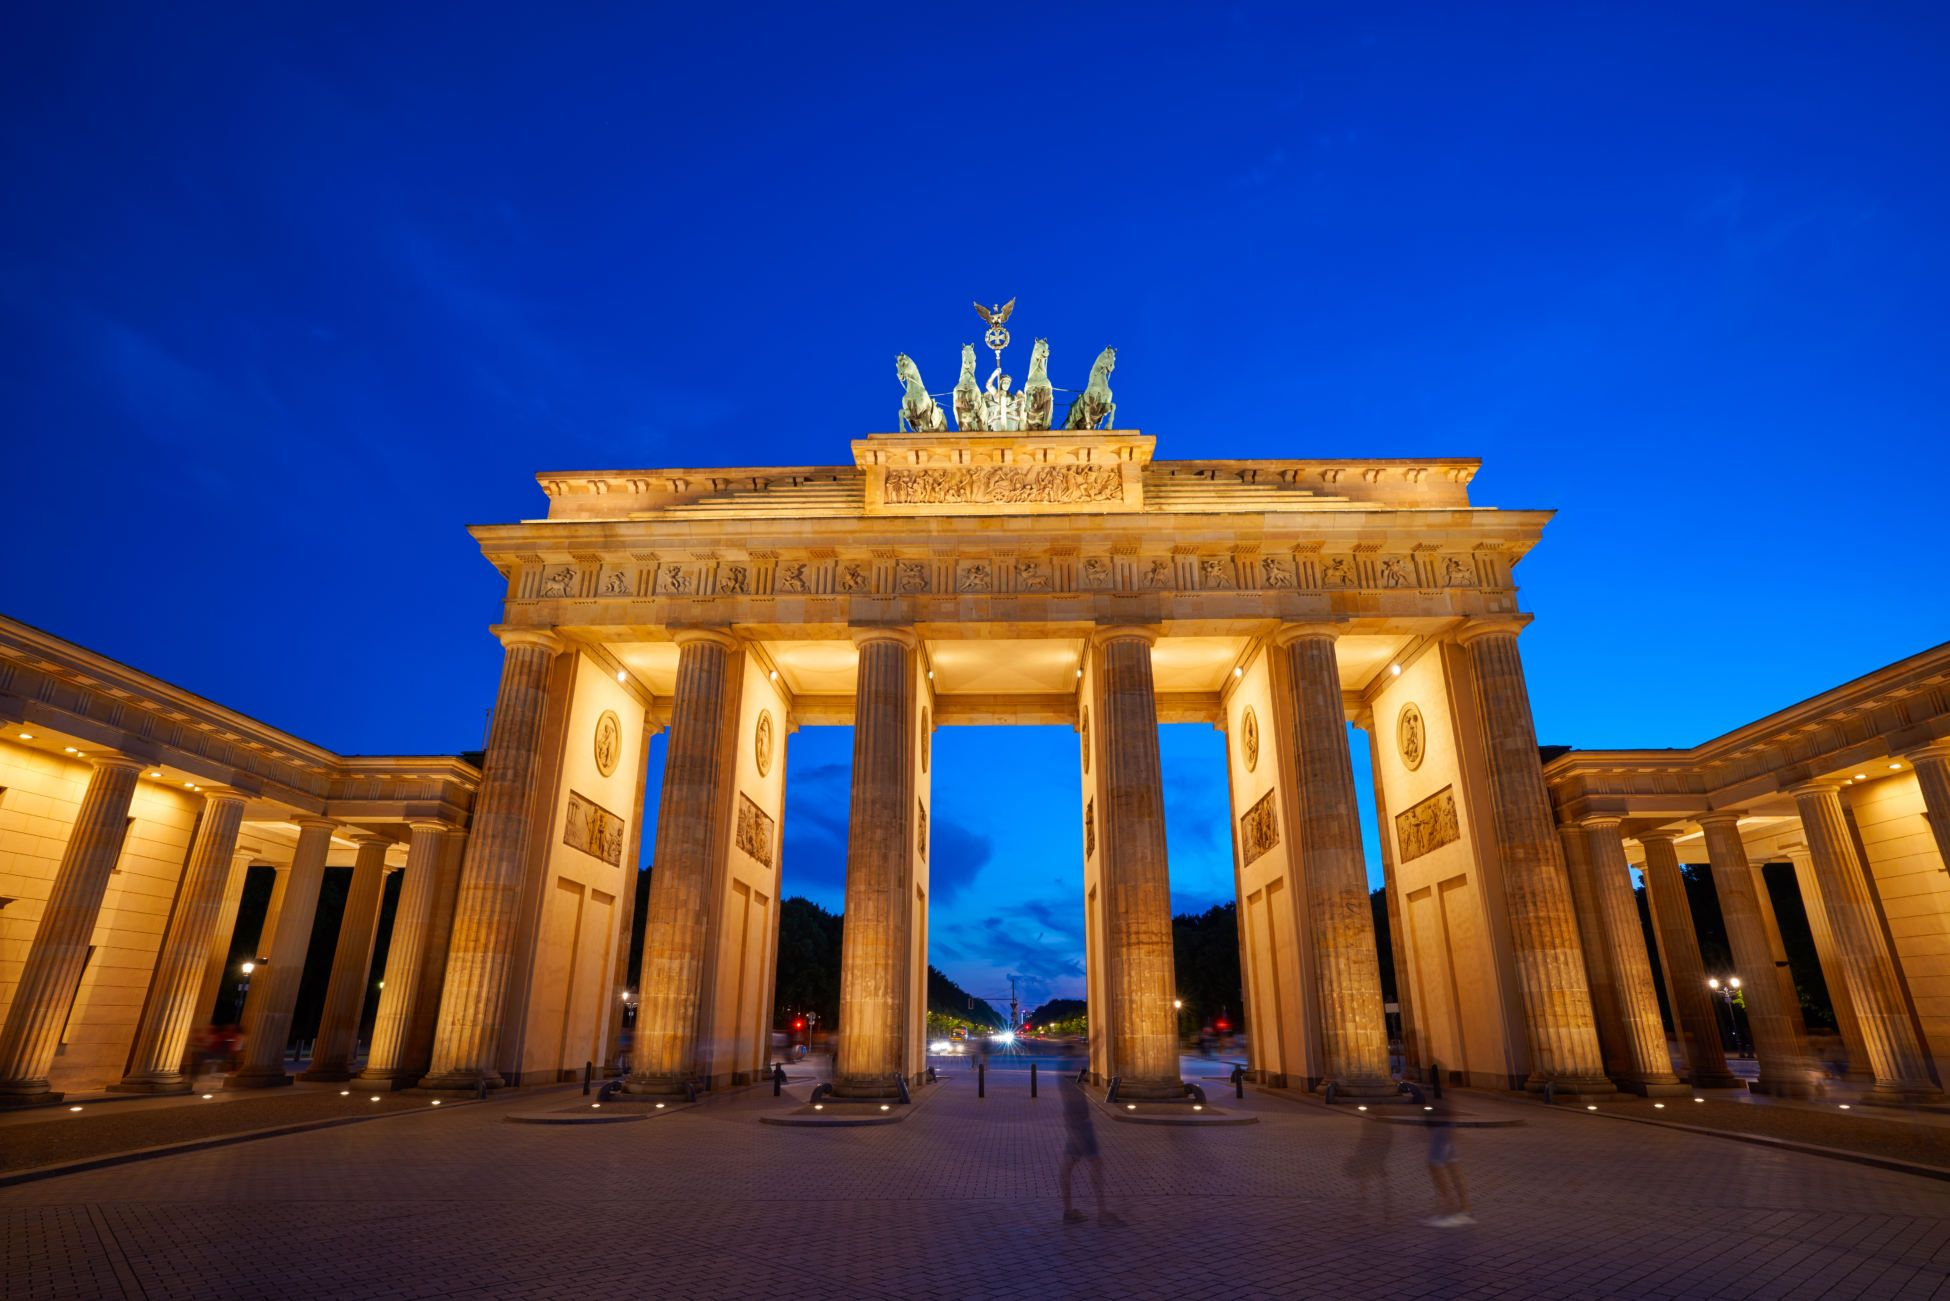 Jga In Berlin In 2020 Brandenburger Tor Berliner Umland Berlin